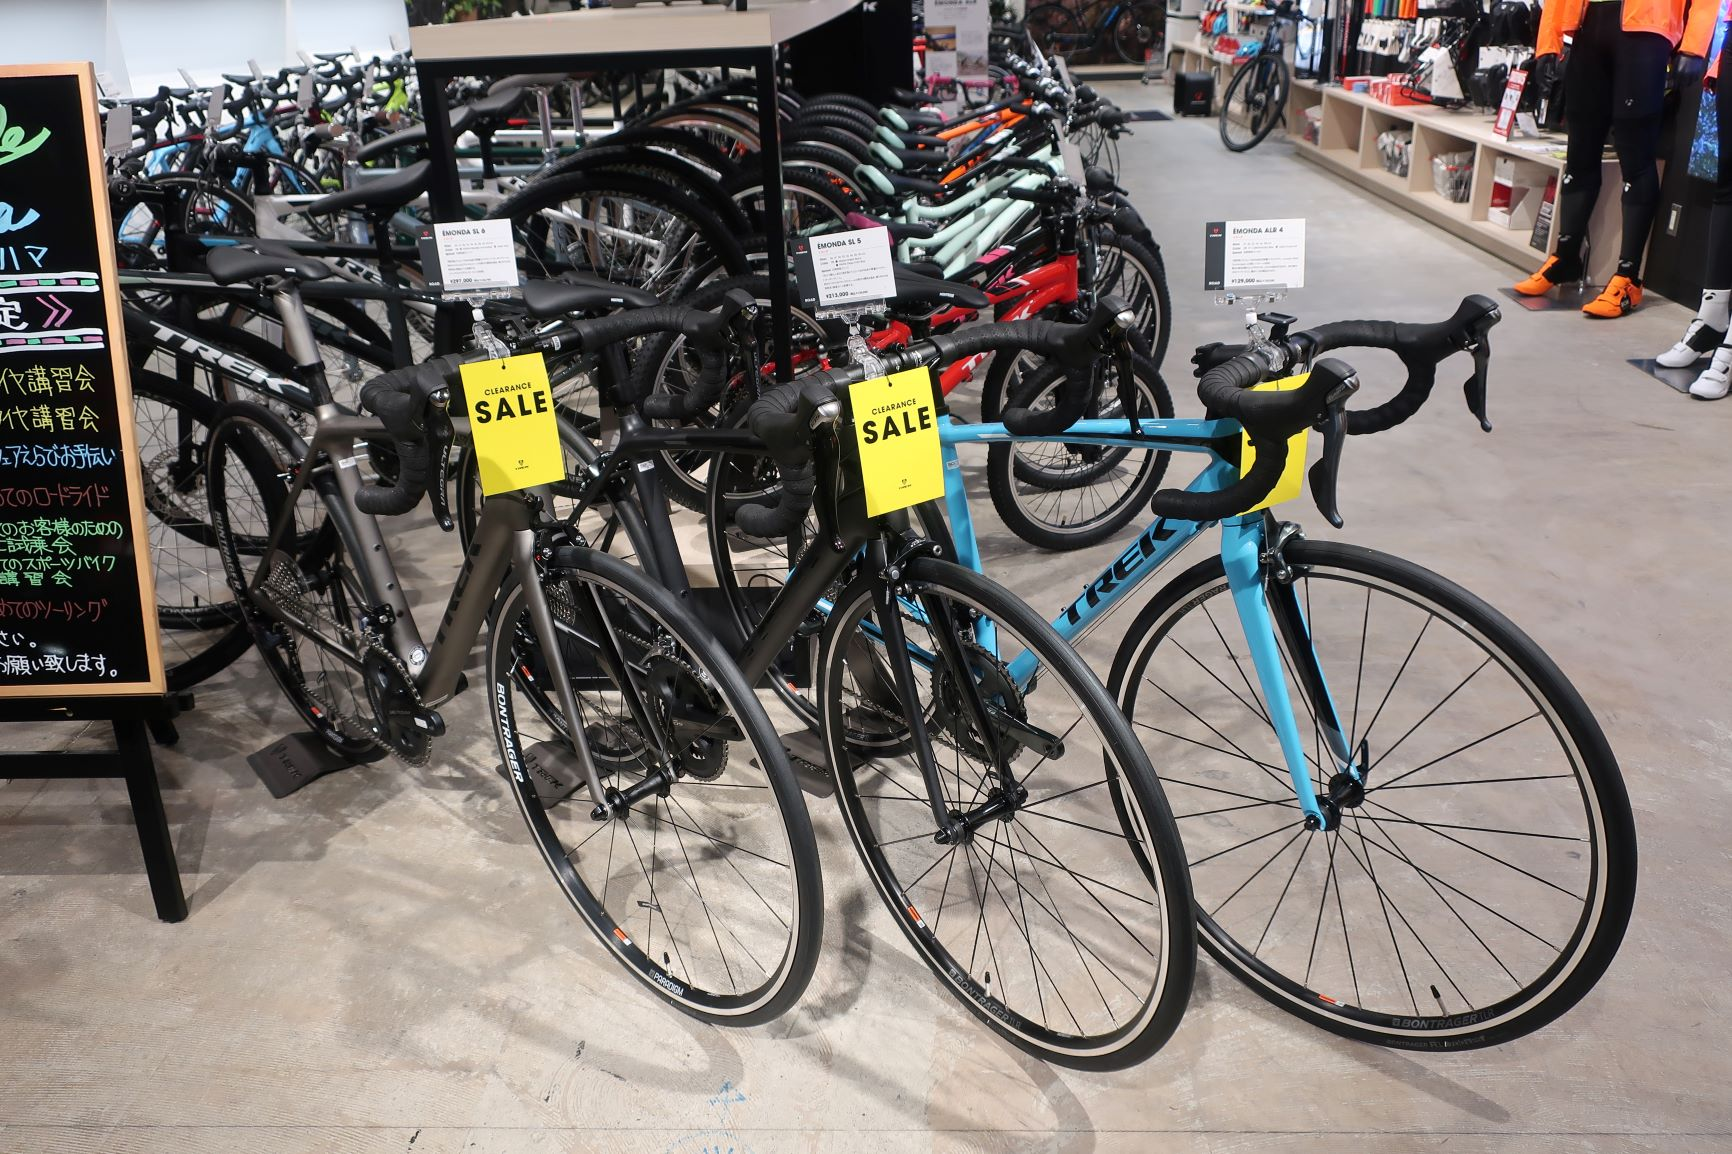 【TREK Bicycle 横浜 】お買い得にスポーツ自転車を始めてみませんか 【初ロード】【クロスバイク】